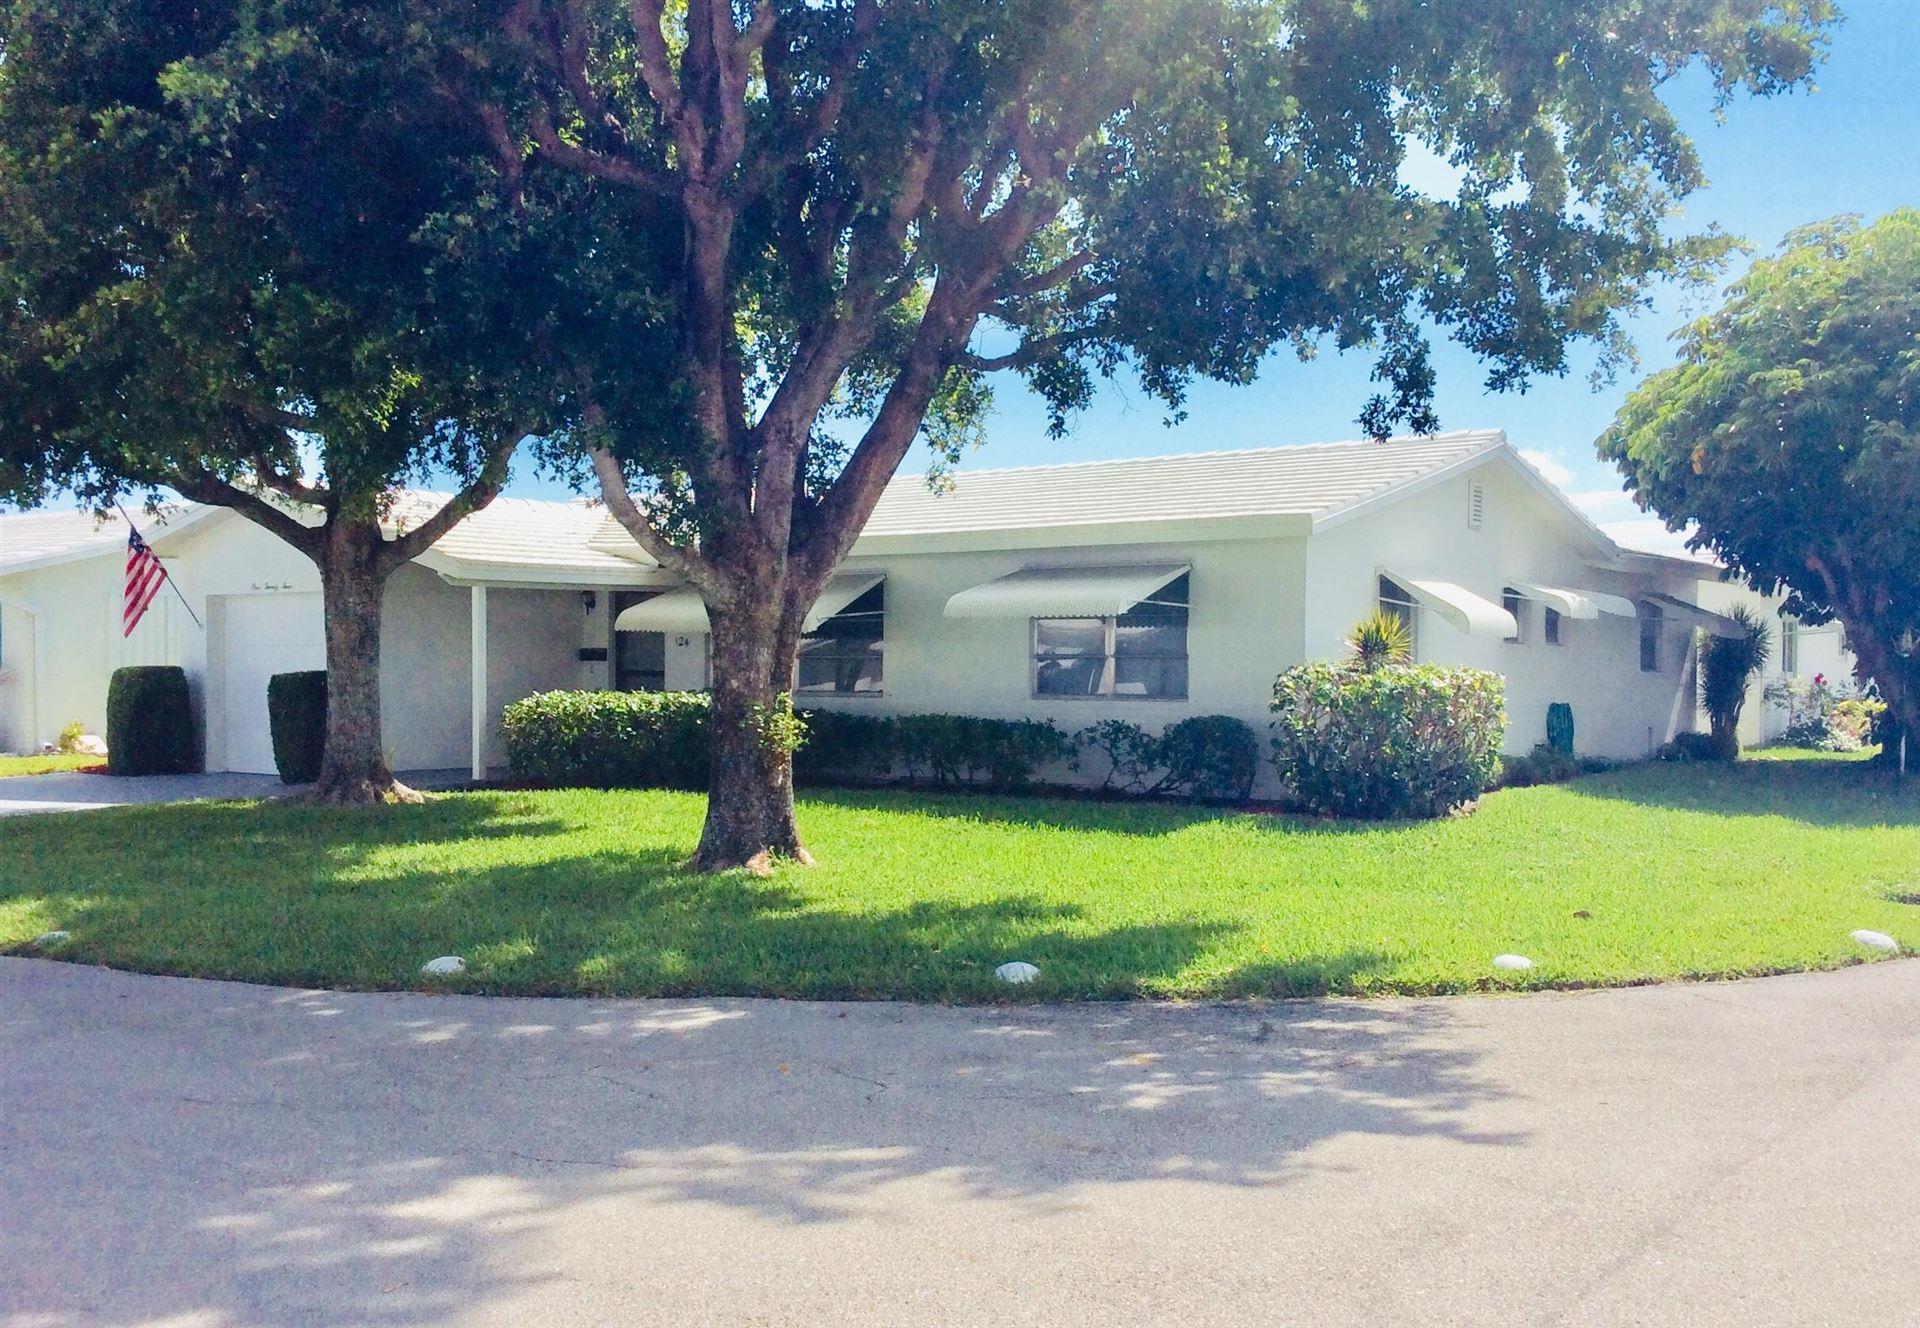 Photo of 124 SW 10th Court, Boynton Beach, FL 33426 (MLS # RX-10715369)